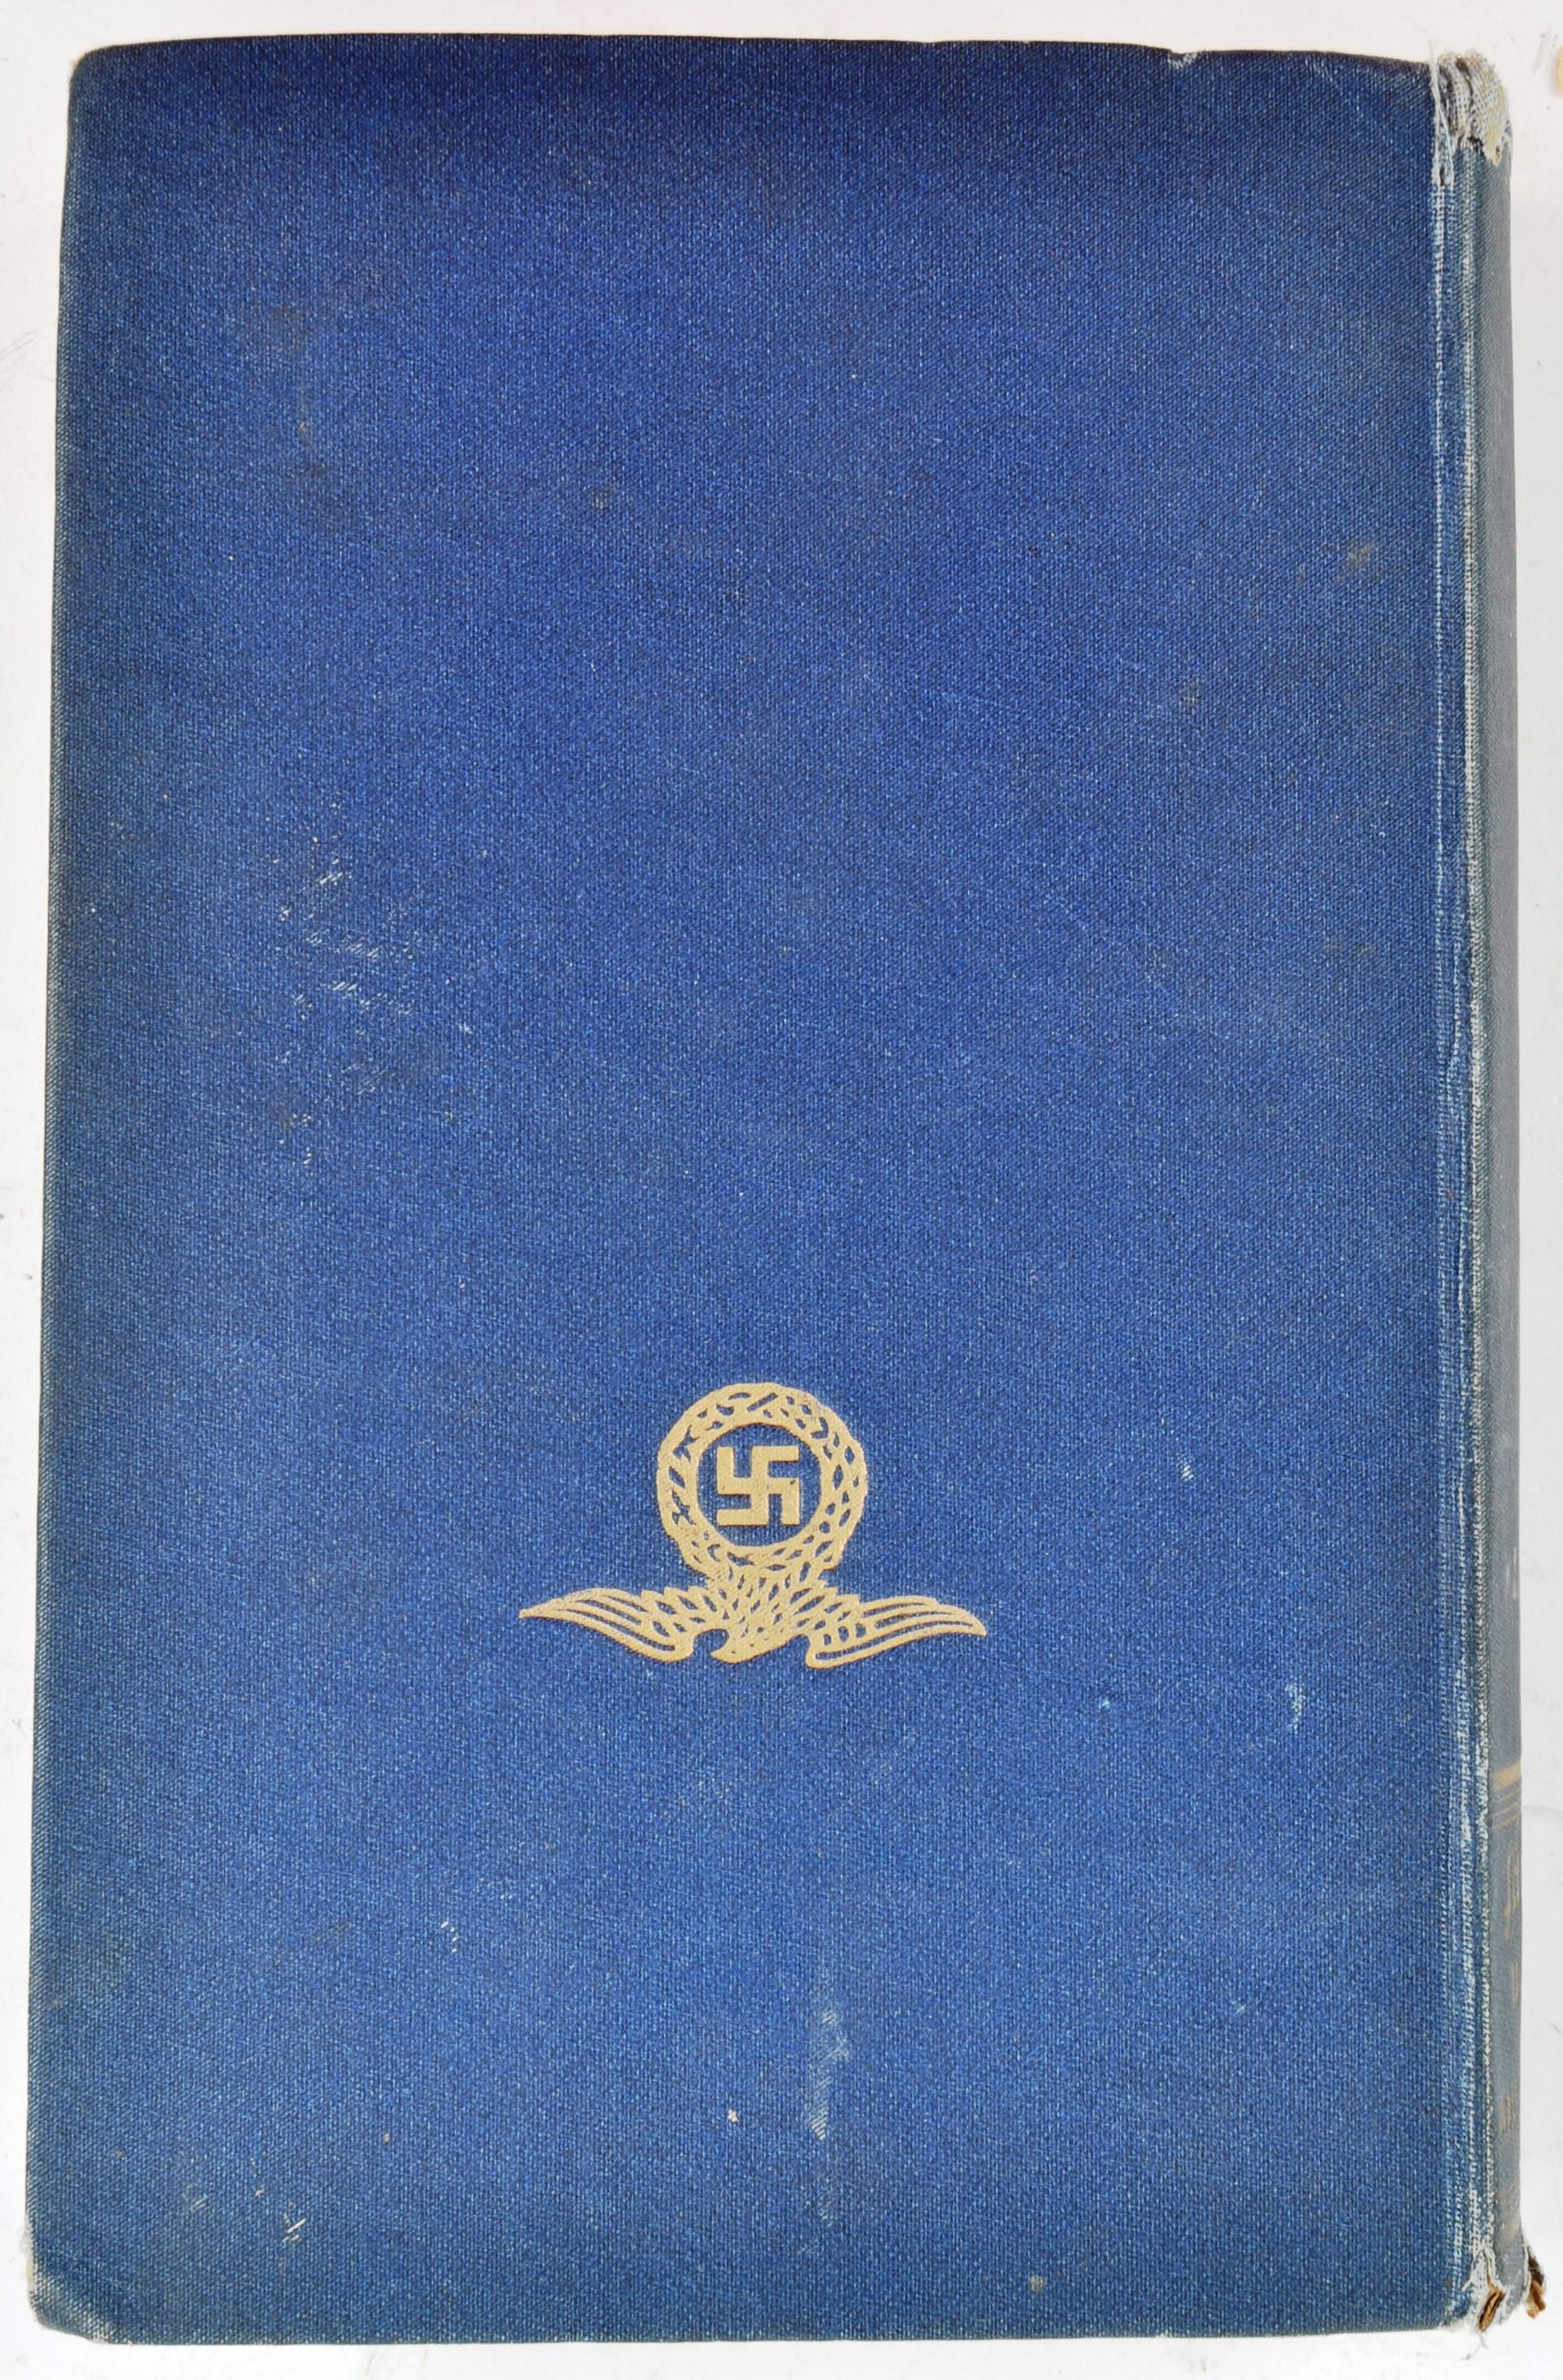 ADOLF HITLER - MEIN KAMPF - 1ST ENGLISH EDITION 1939 - Image 7 of 9